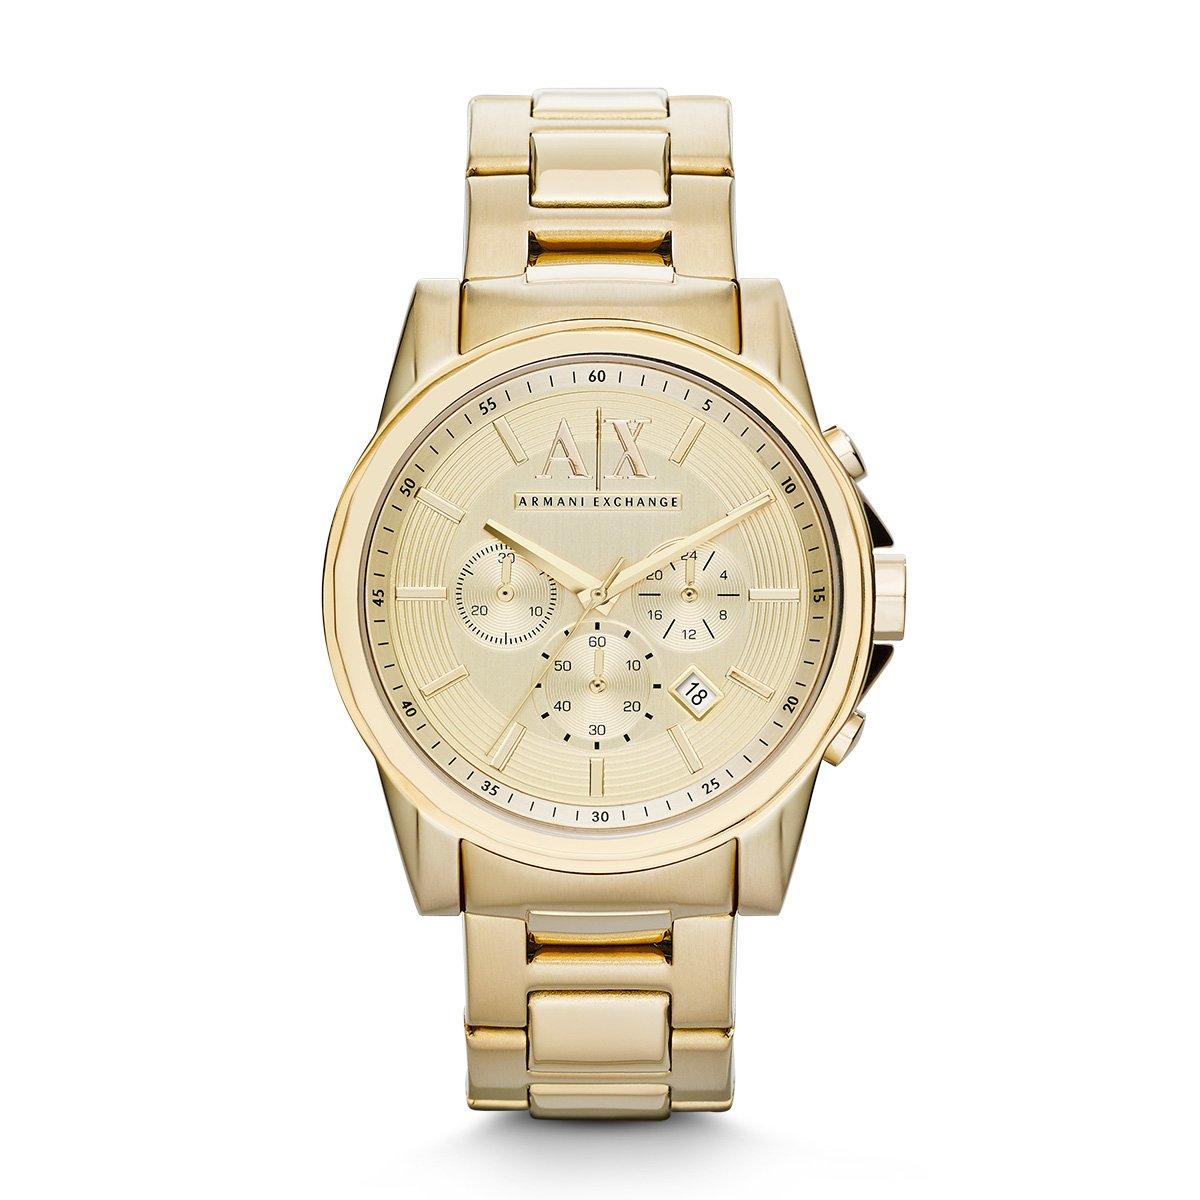 85fcb7899be9 Reloj caballero armani exchange ax2099